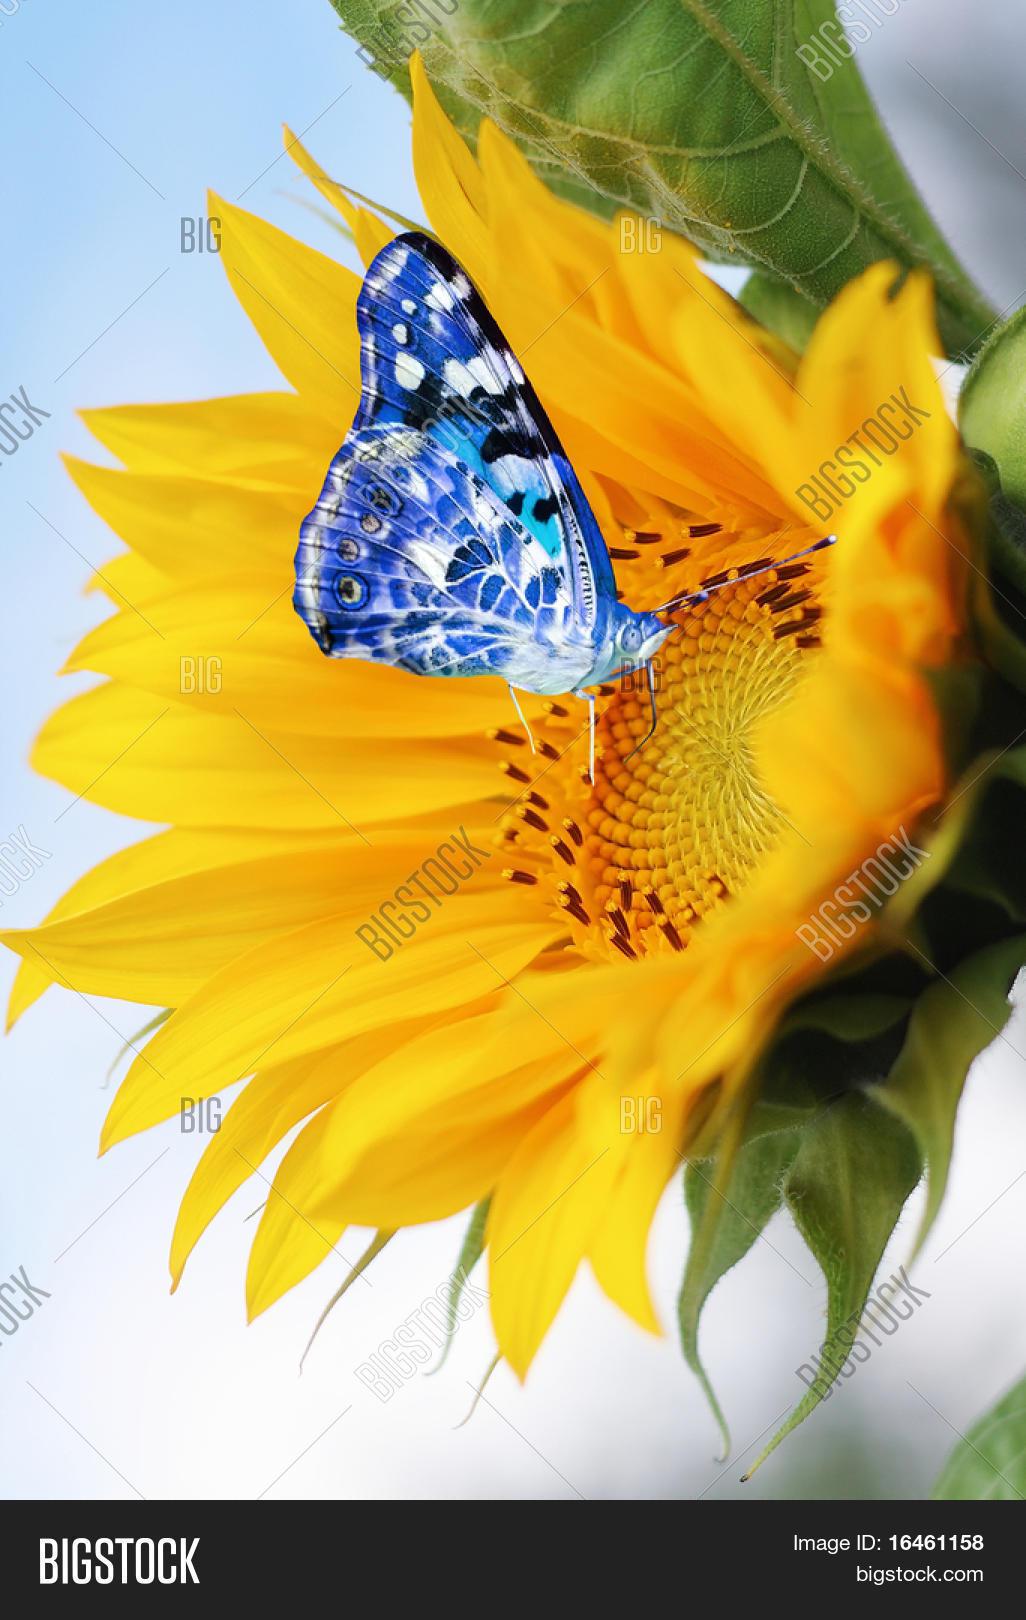 Sunflower Blue Butterfly Image & Photo | Bigstock